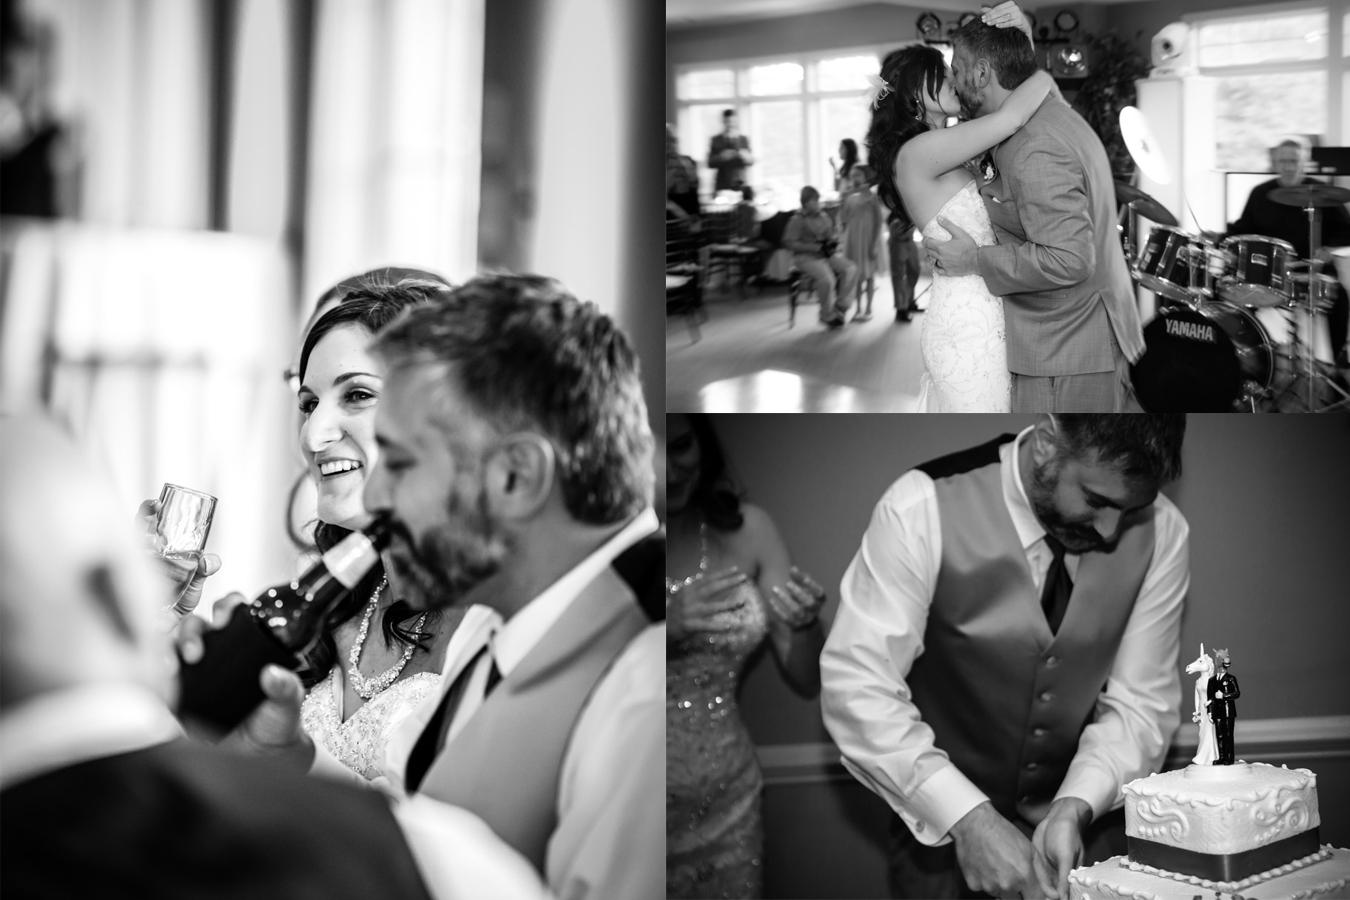 NEPA_Pocono_Weddings_Rob_Lettieri_Photography_15.jpg